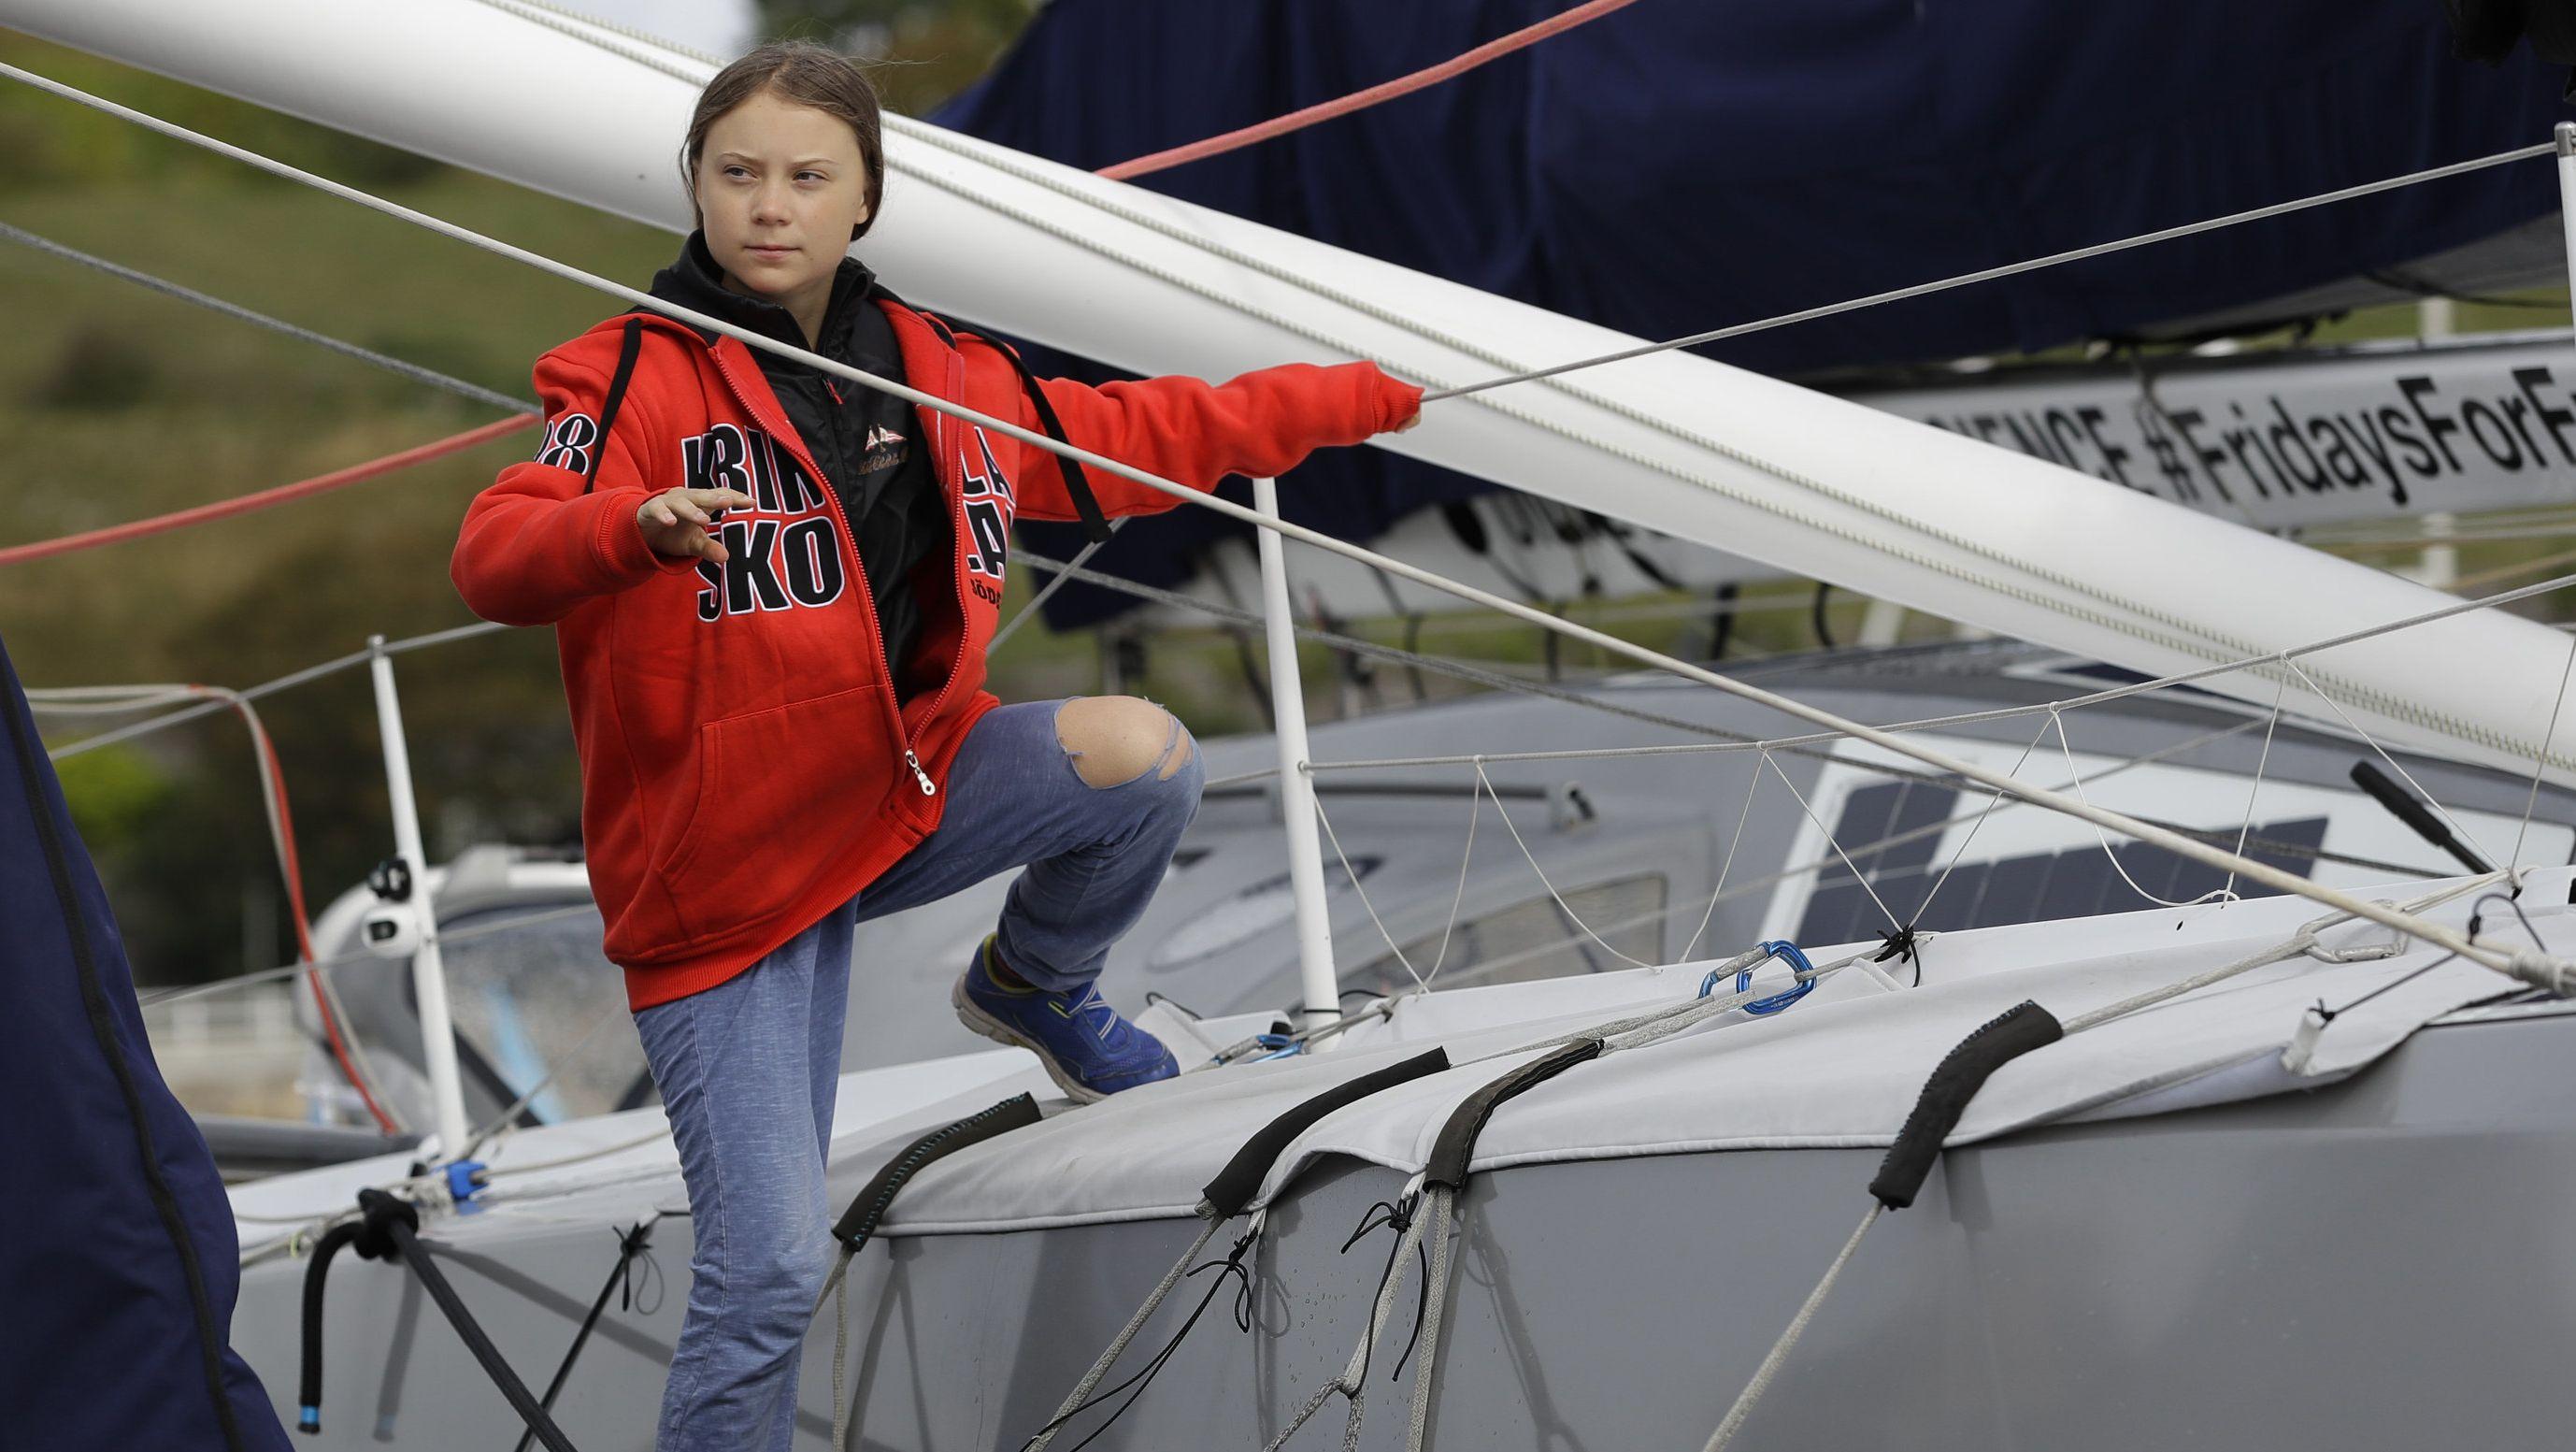 Klimaaktivistin Thunberg will den Atlantik überqueren